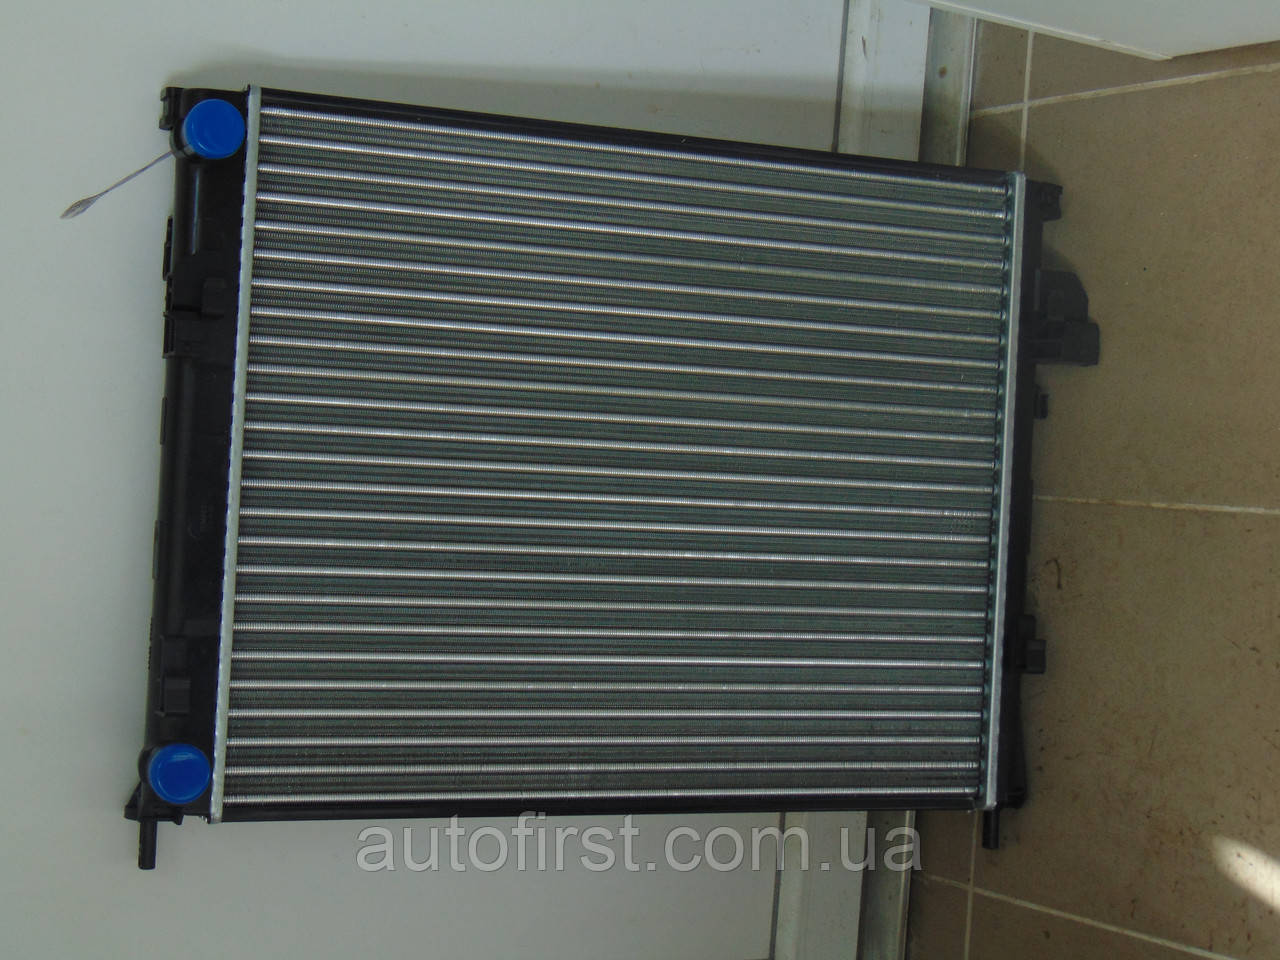 TEMPEST Радиатор двигателя Renault Trafic, Opel Vivaro